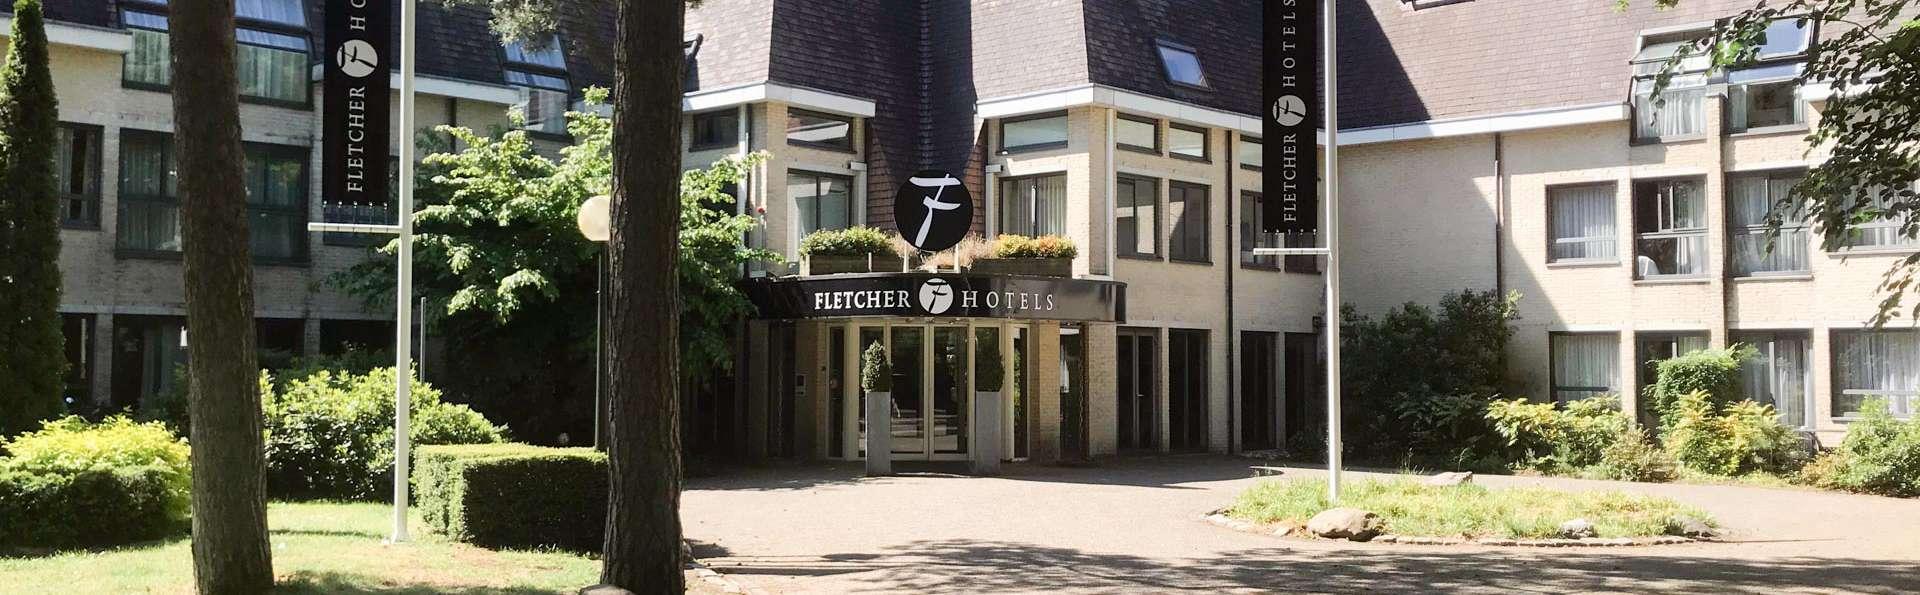 Fletcher Hotel Restaurant Epe - Zwolle - EDIT_NEW_FRONT_01.jpg